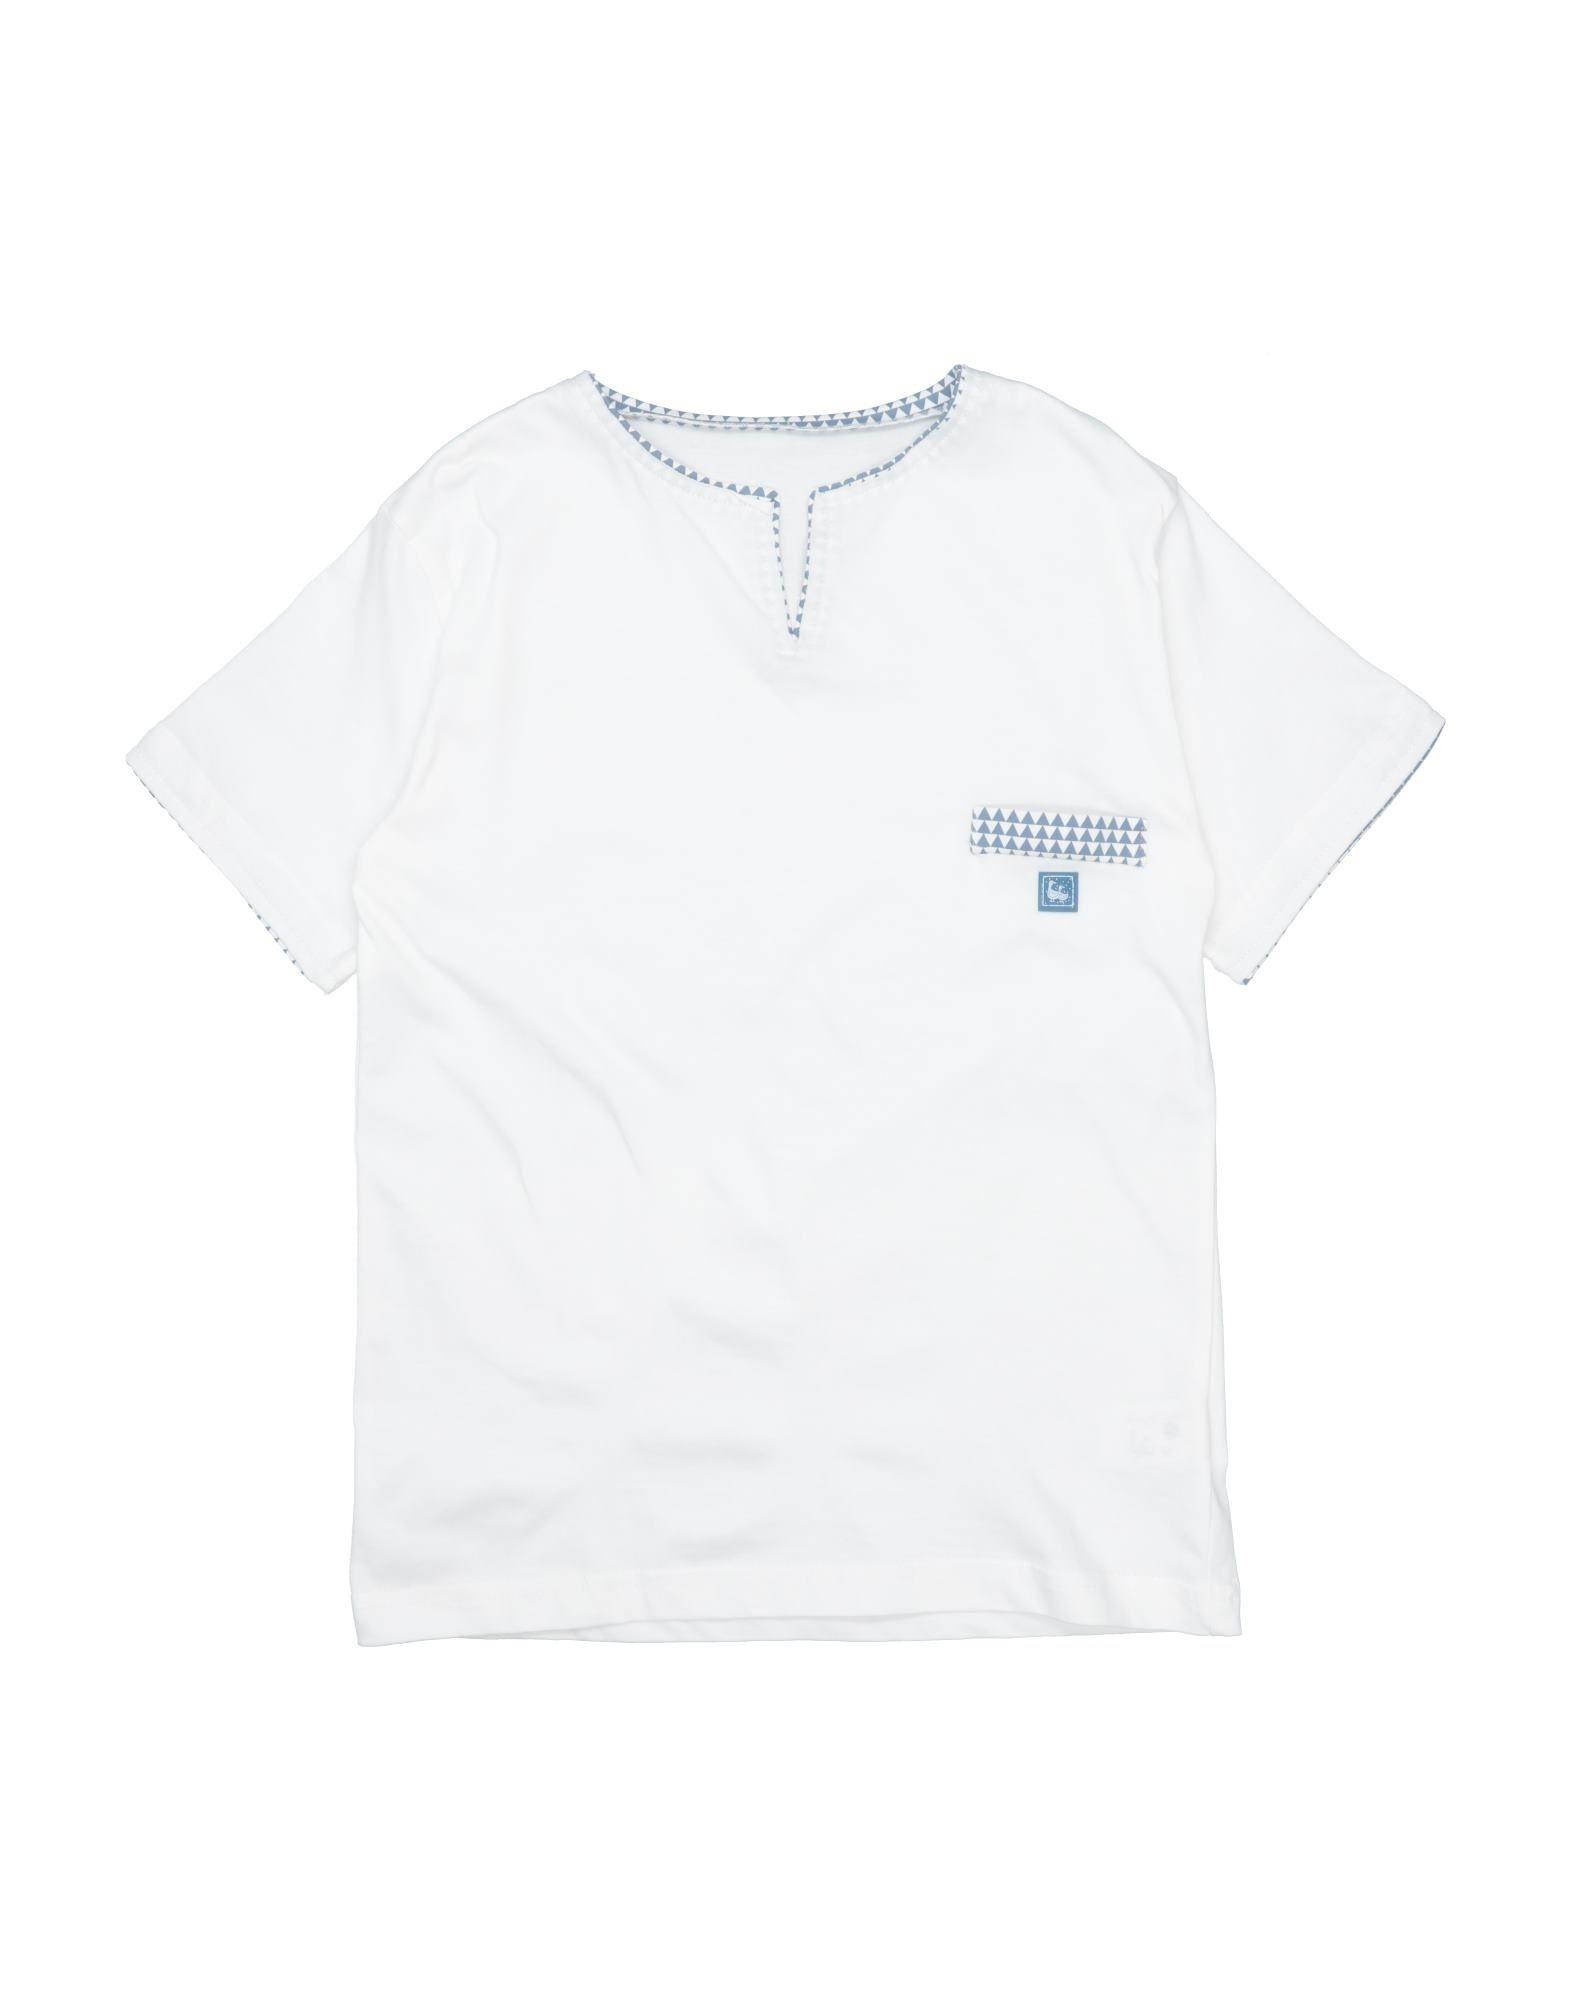 Al Agua Patos Kids' T-shirts In White